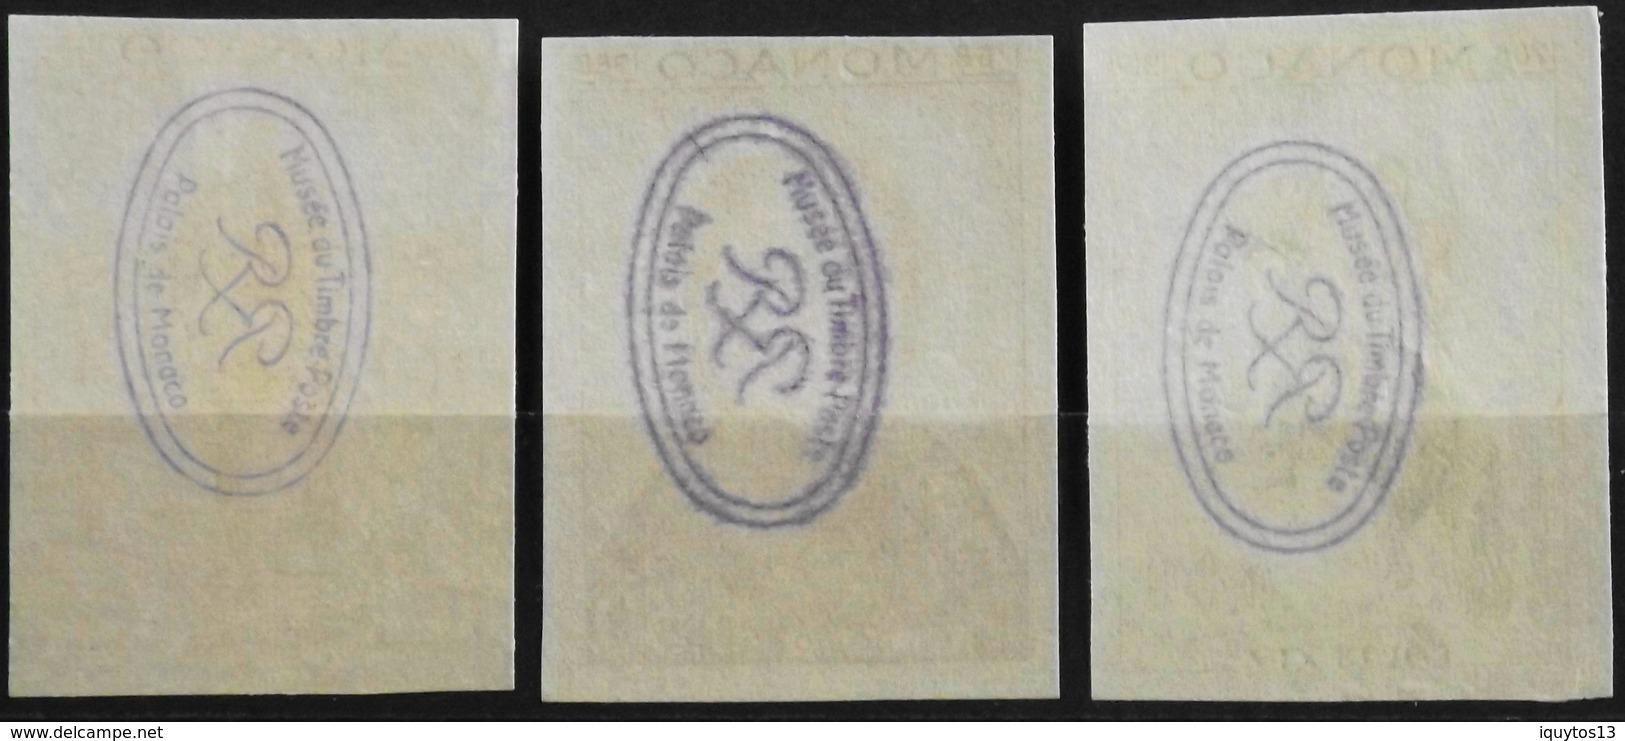 MONACO 1968 - Série BOSIO N° 765 -766 - 767 - 3 Timbres NON DENTELE GOMME - Parfait Etat - Monaco